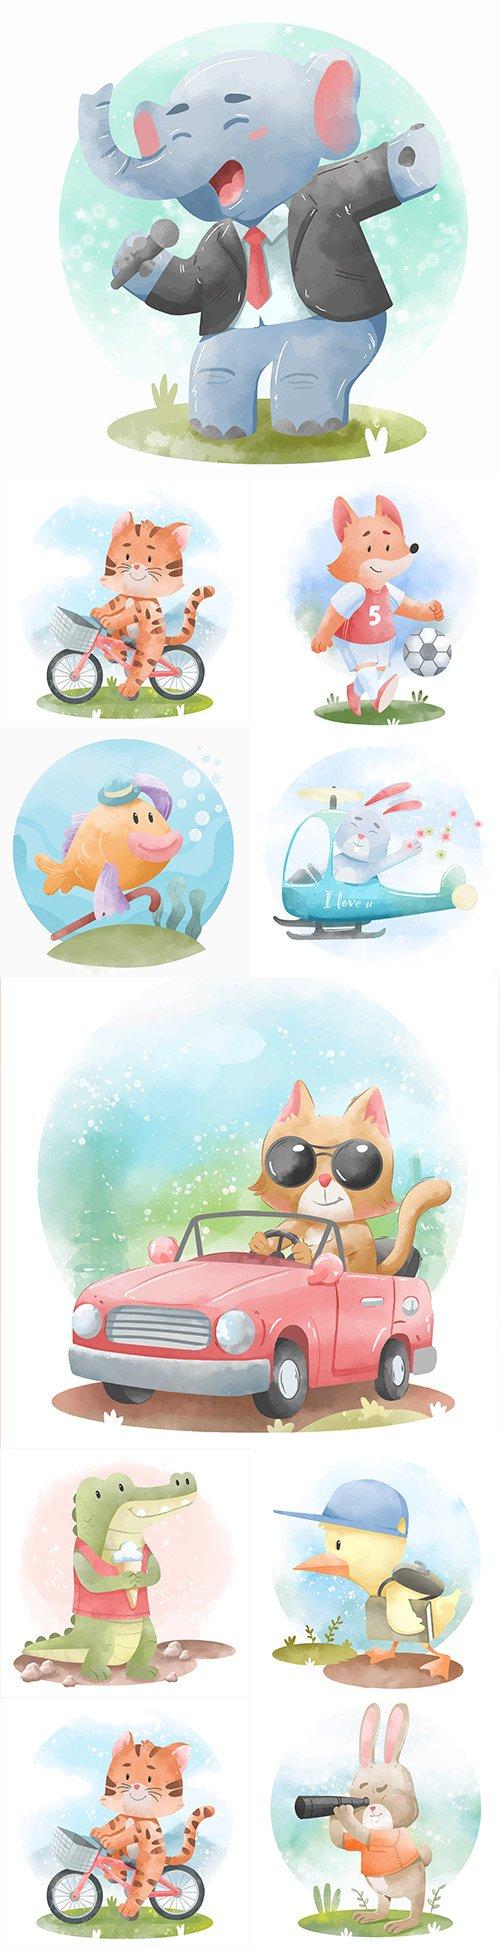 Cute cartoon animals' watercolor illustrations 6